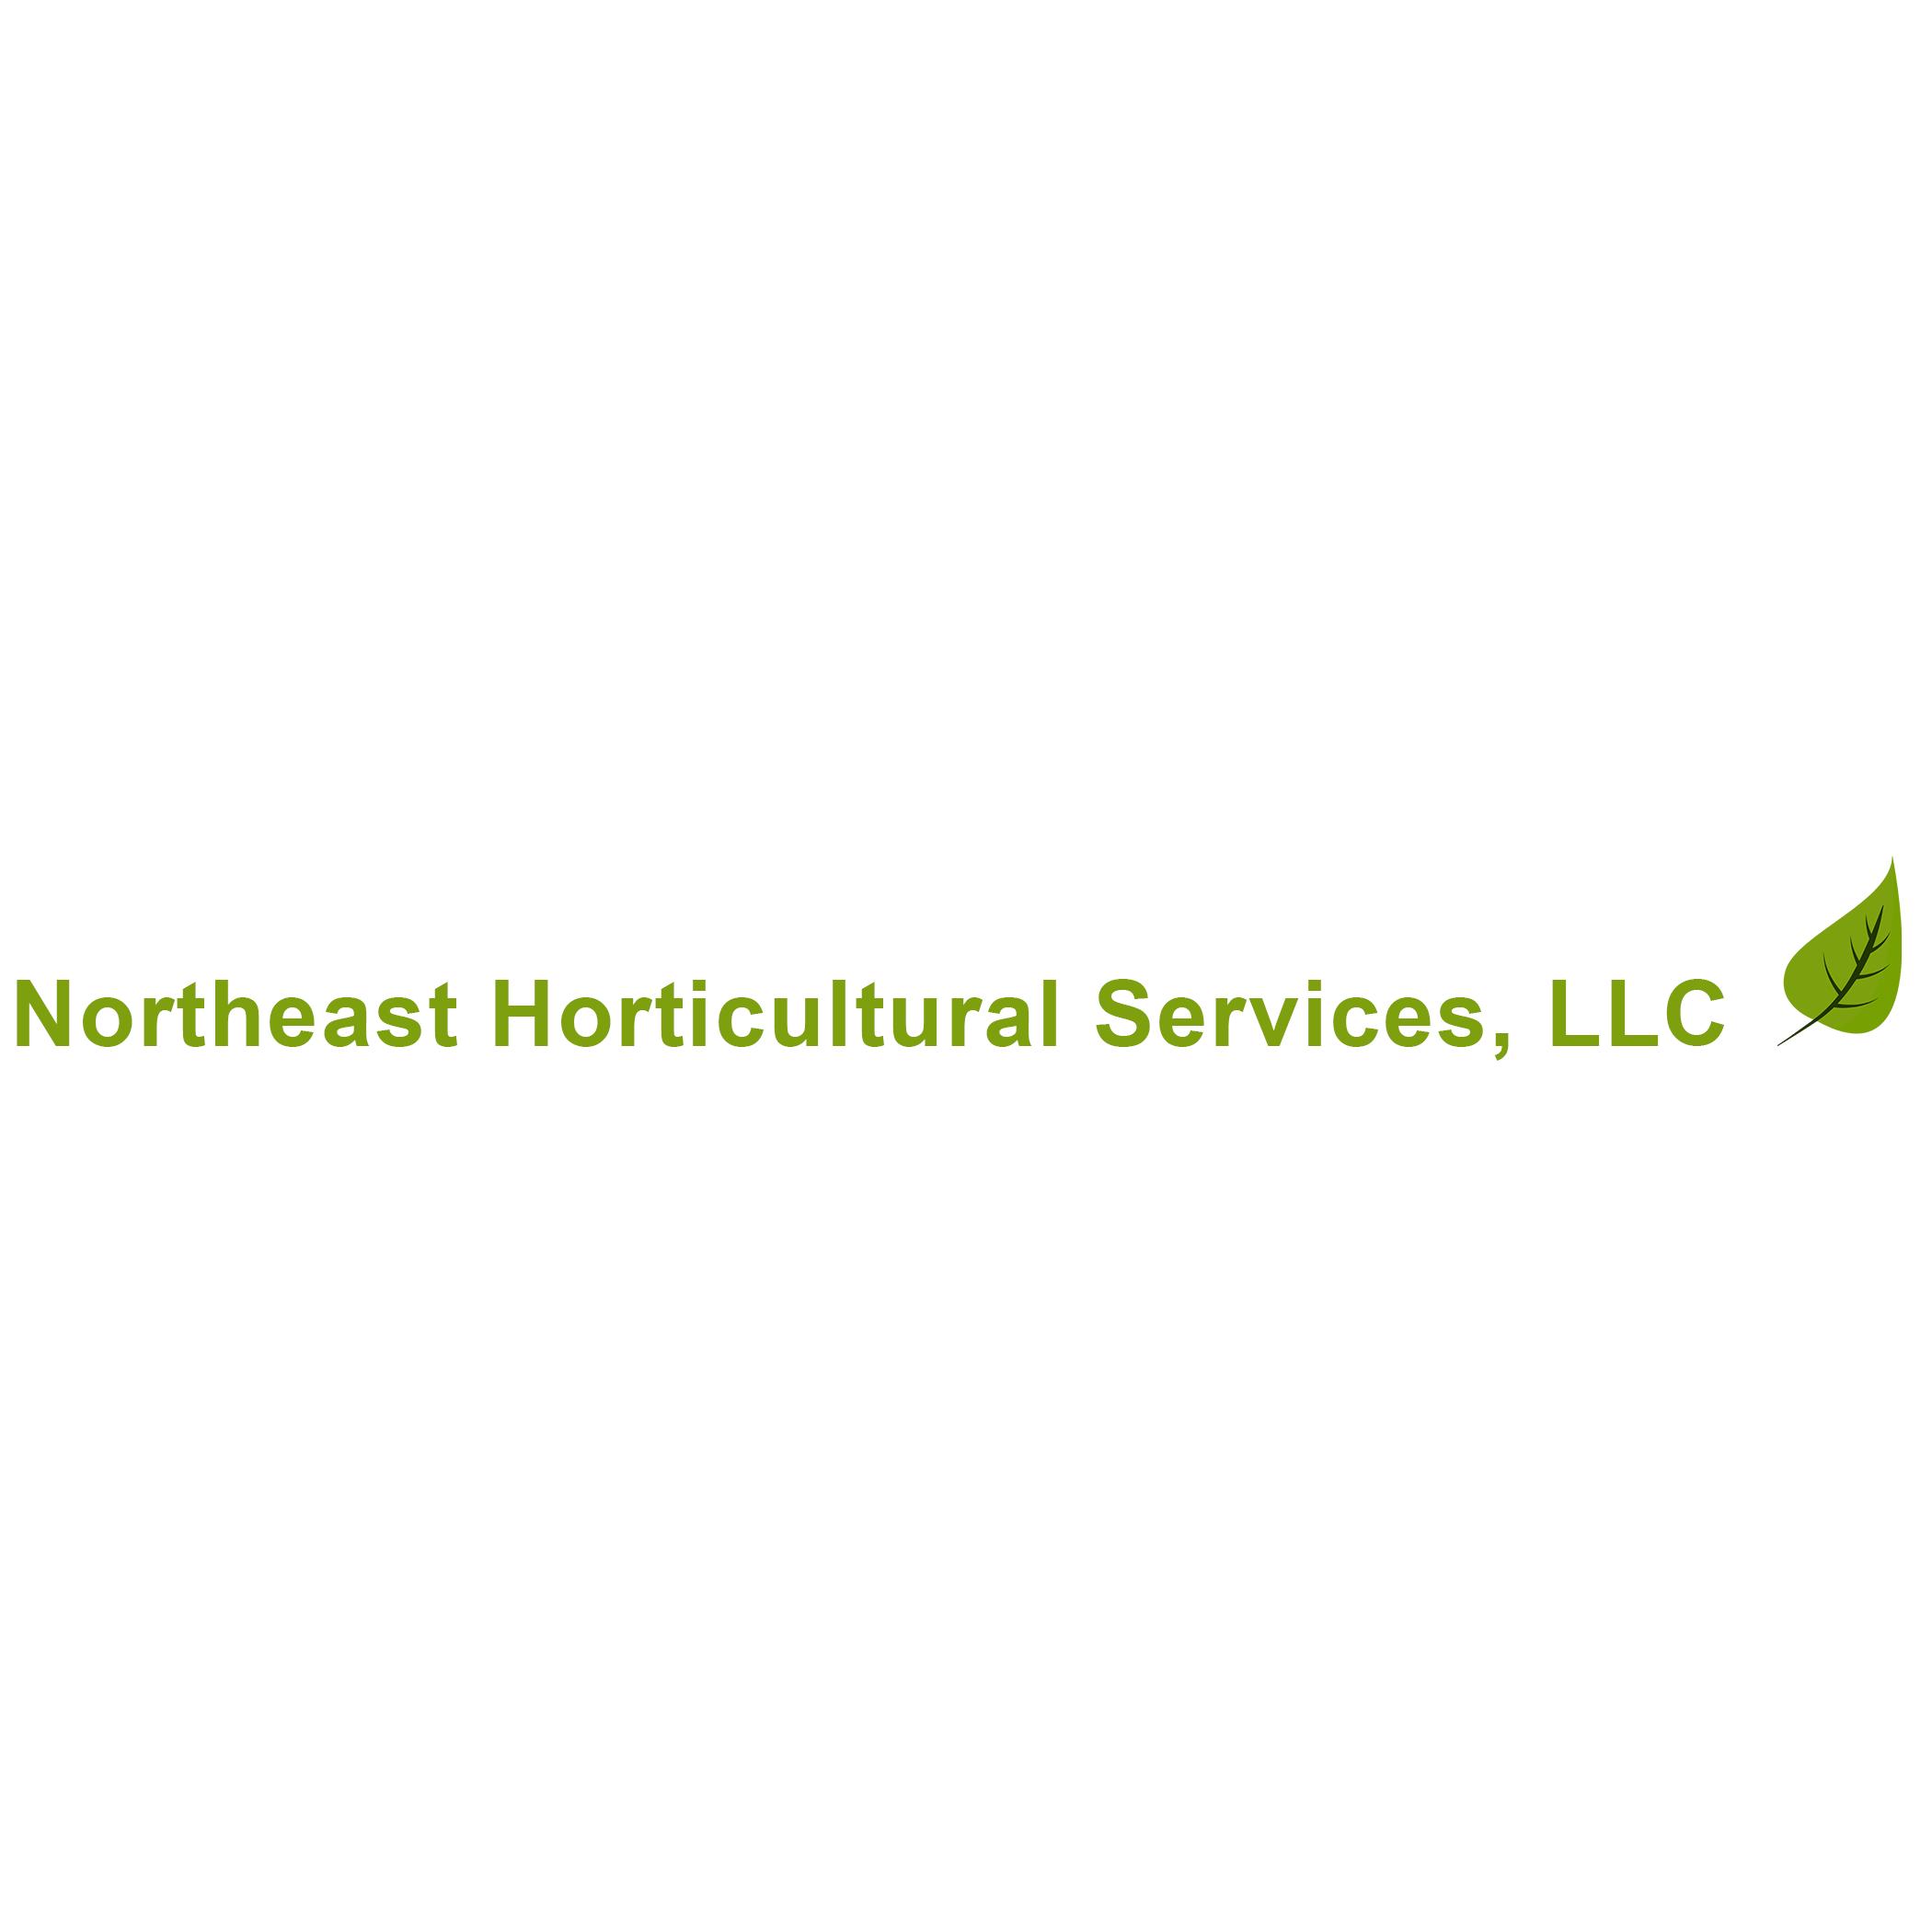 Northeast Horticultural Services, LLC